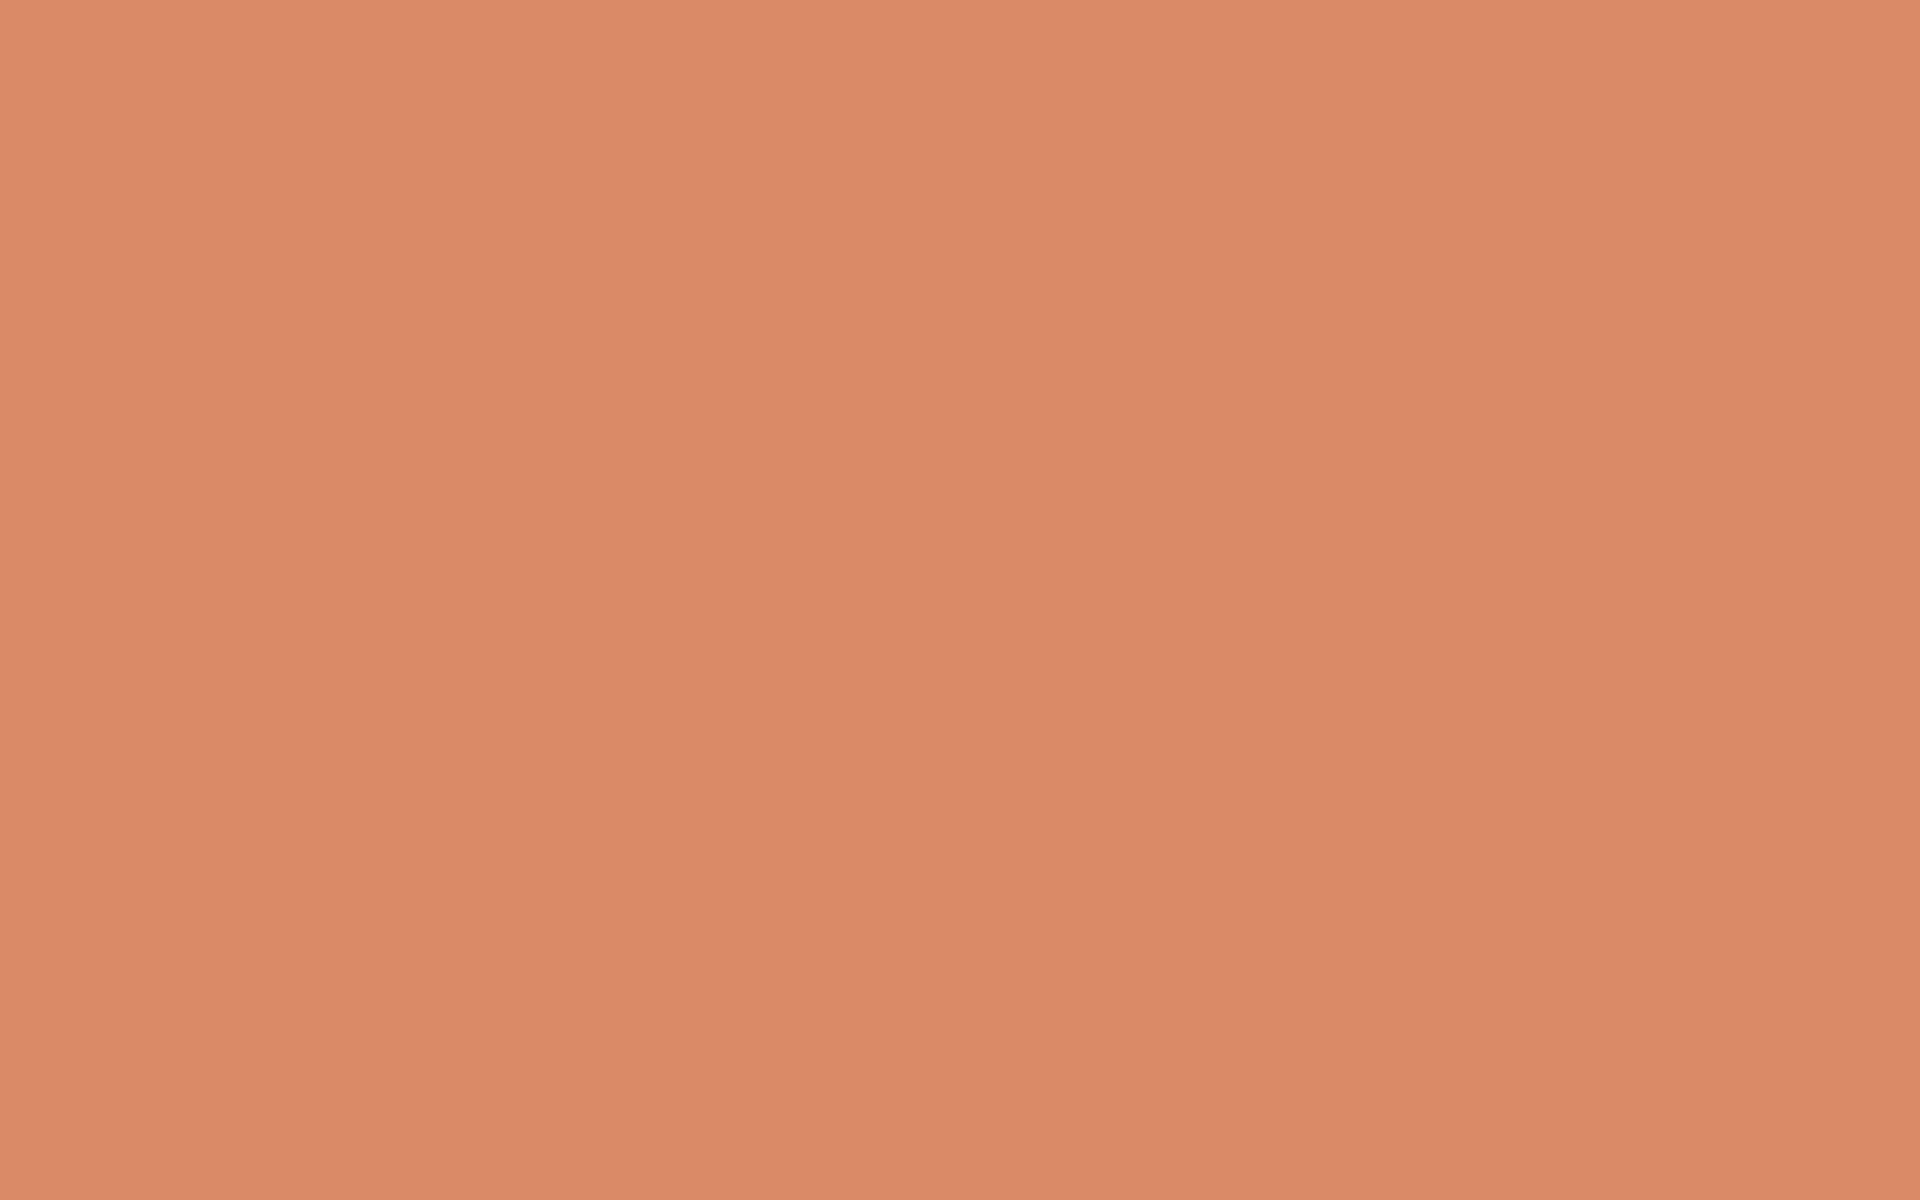 1920x1200 Pale Copper Solid Color Background